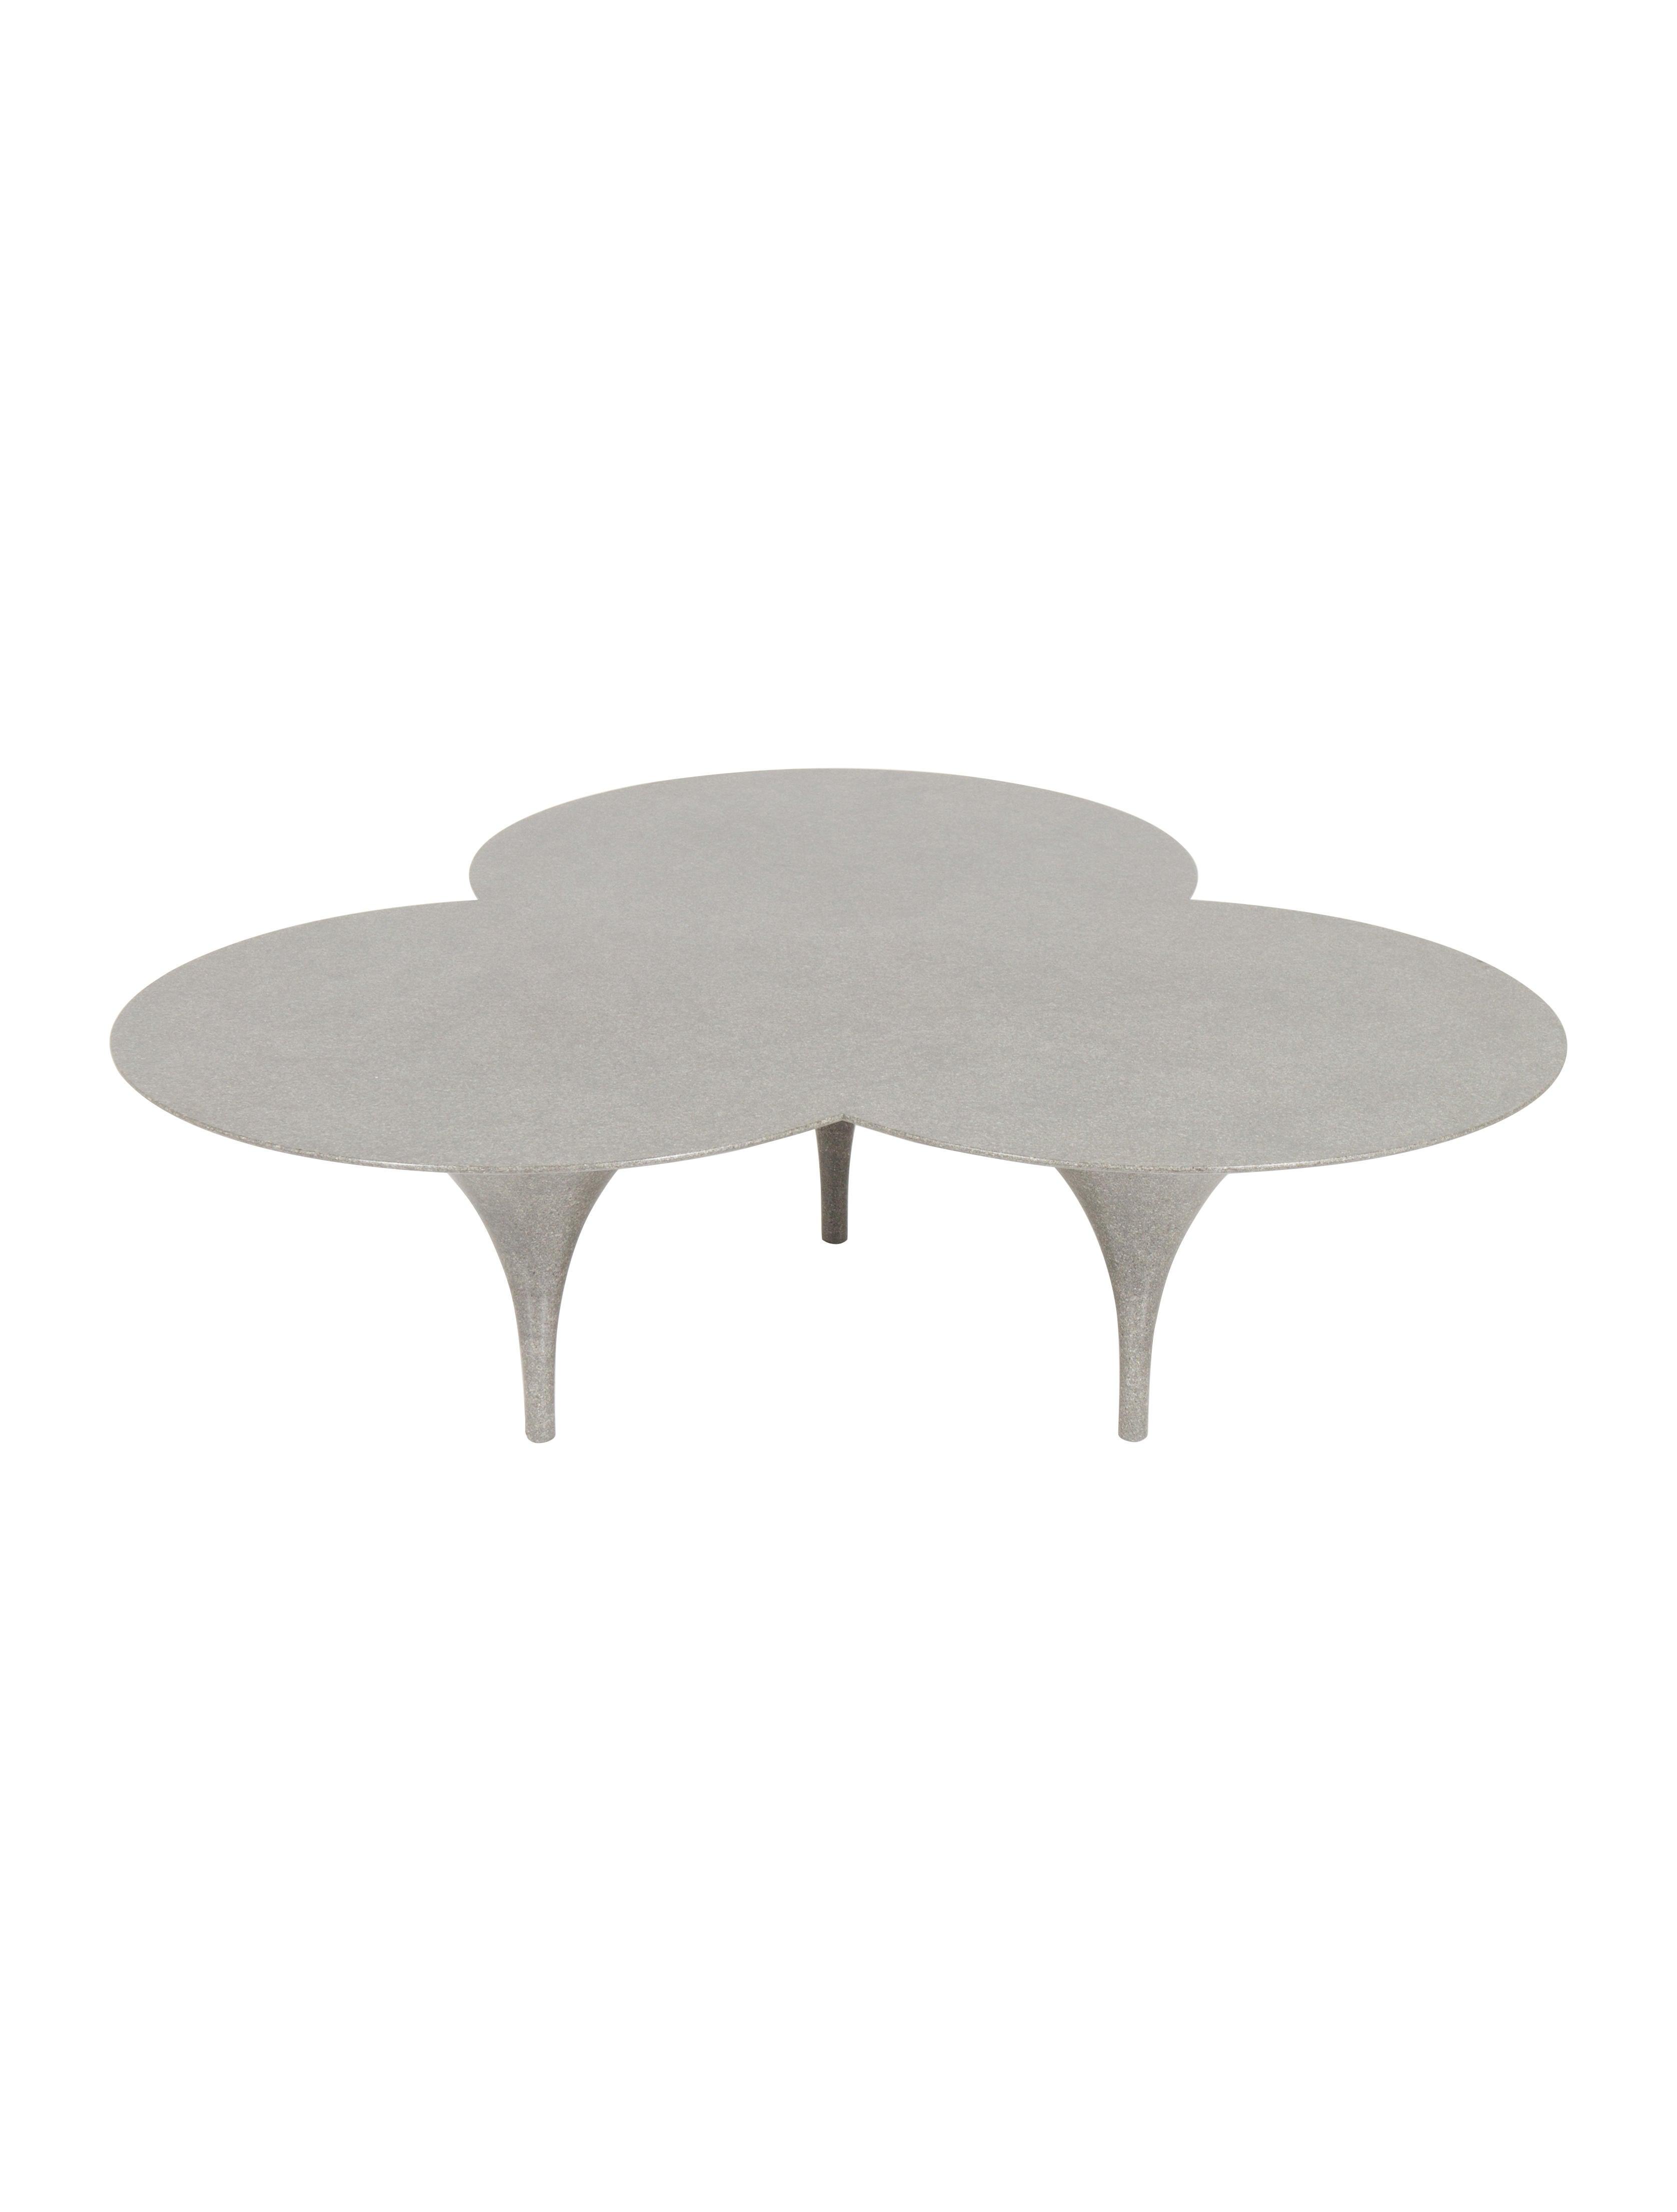 Carlo Pessina Morotai Multifunctional Table Furniture